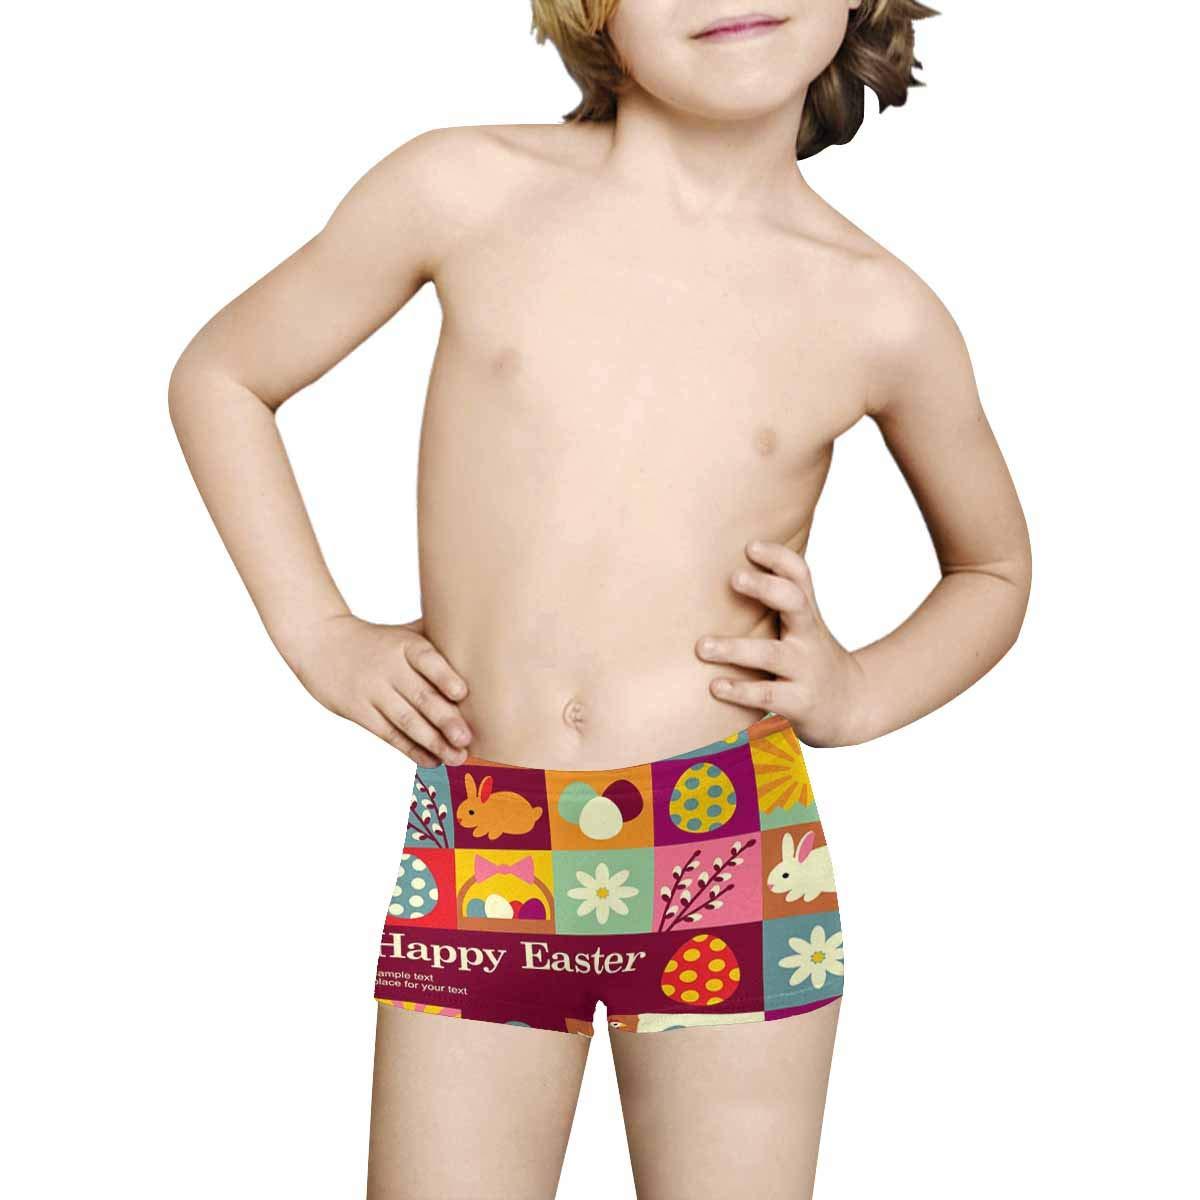 5T-2XL INTERESTPRINT Kids Happy Easter ComfortSoft Printed Boxer Briefs